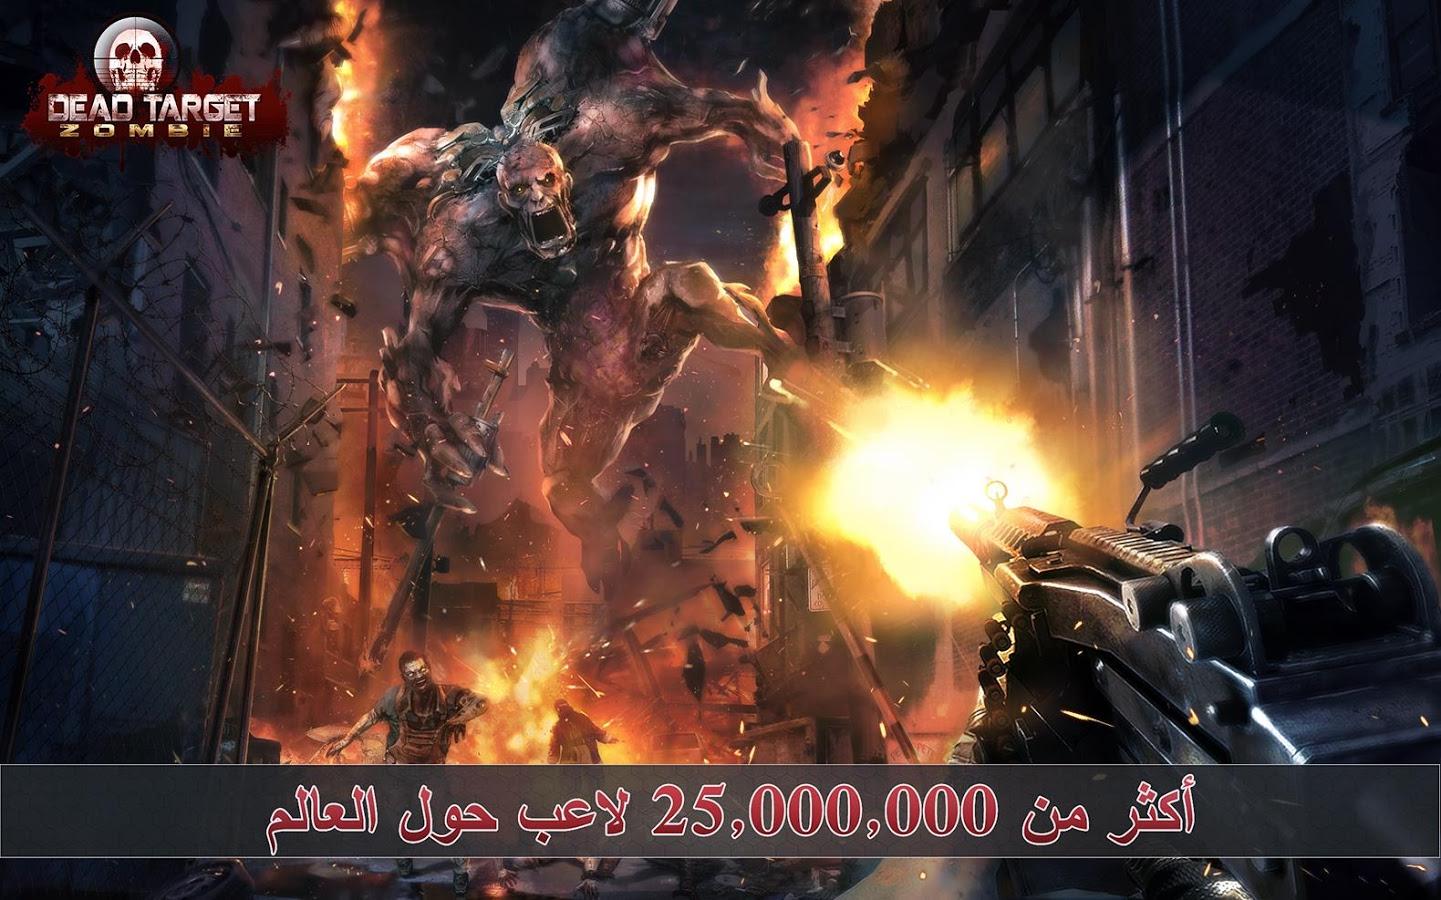 http://apkmode1.blogspot.com/2016/12/dead-target-zombie-v-263.html